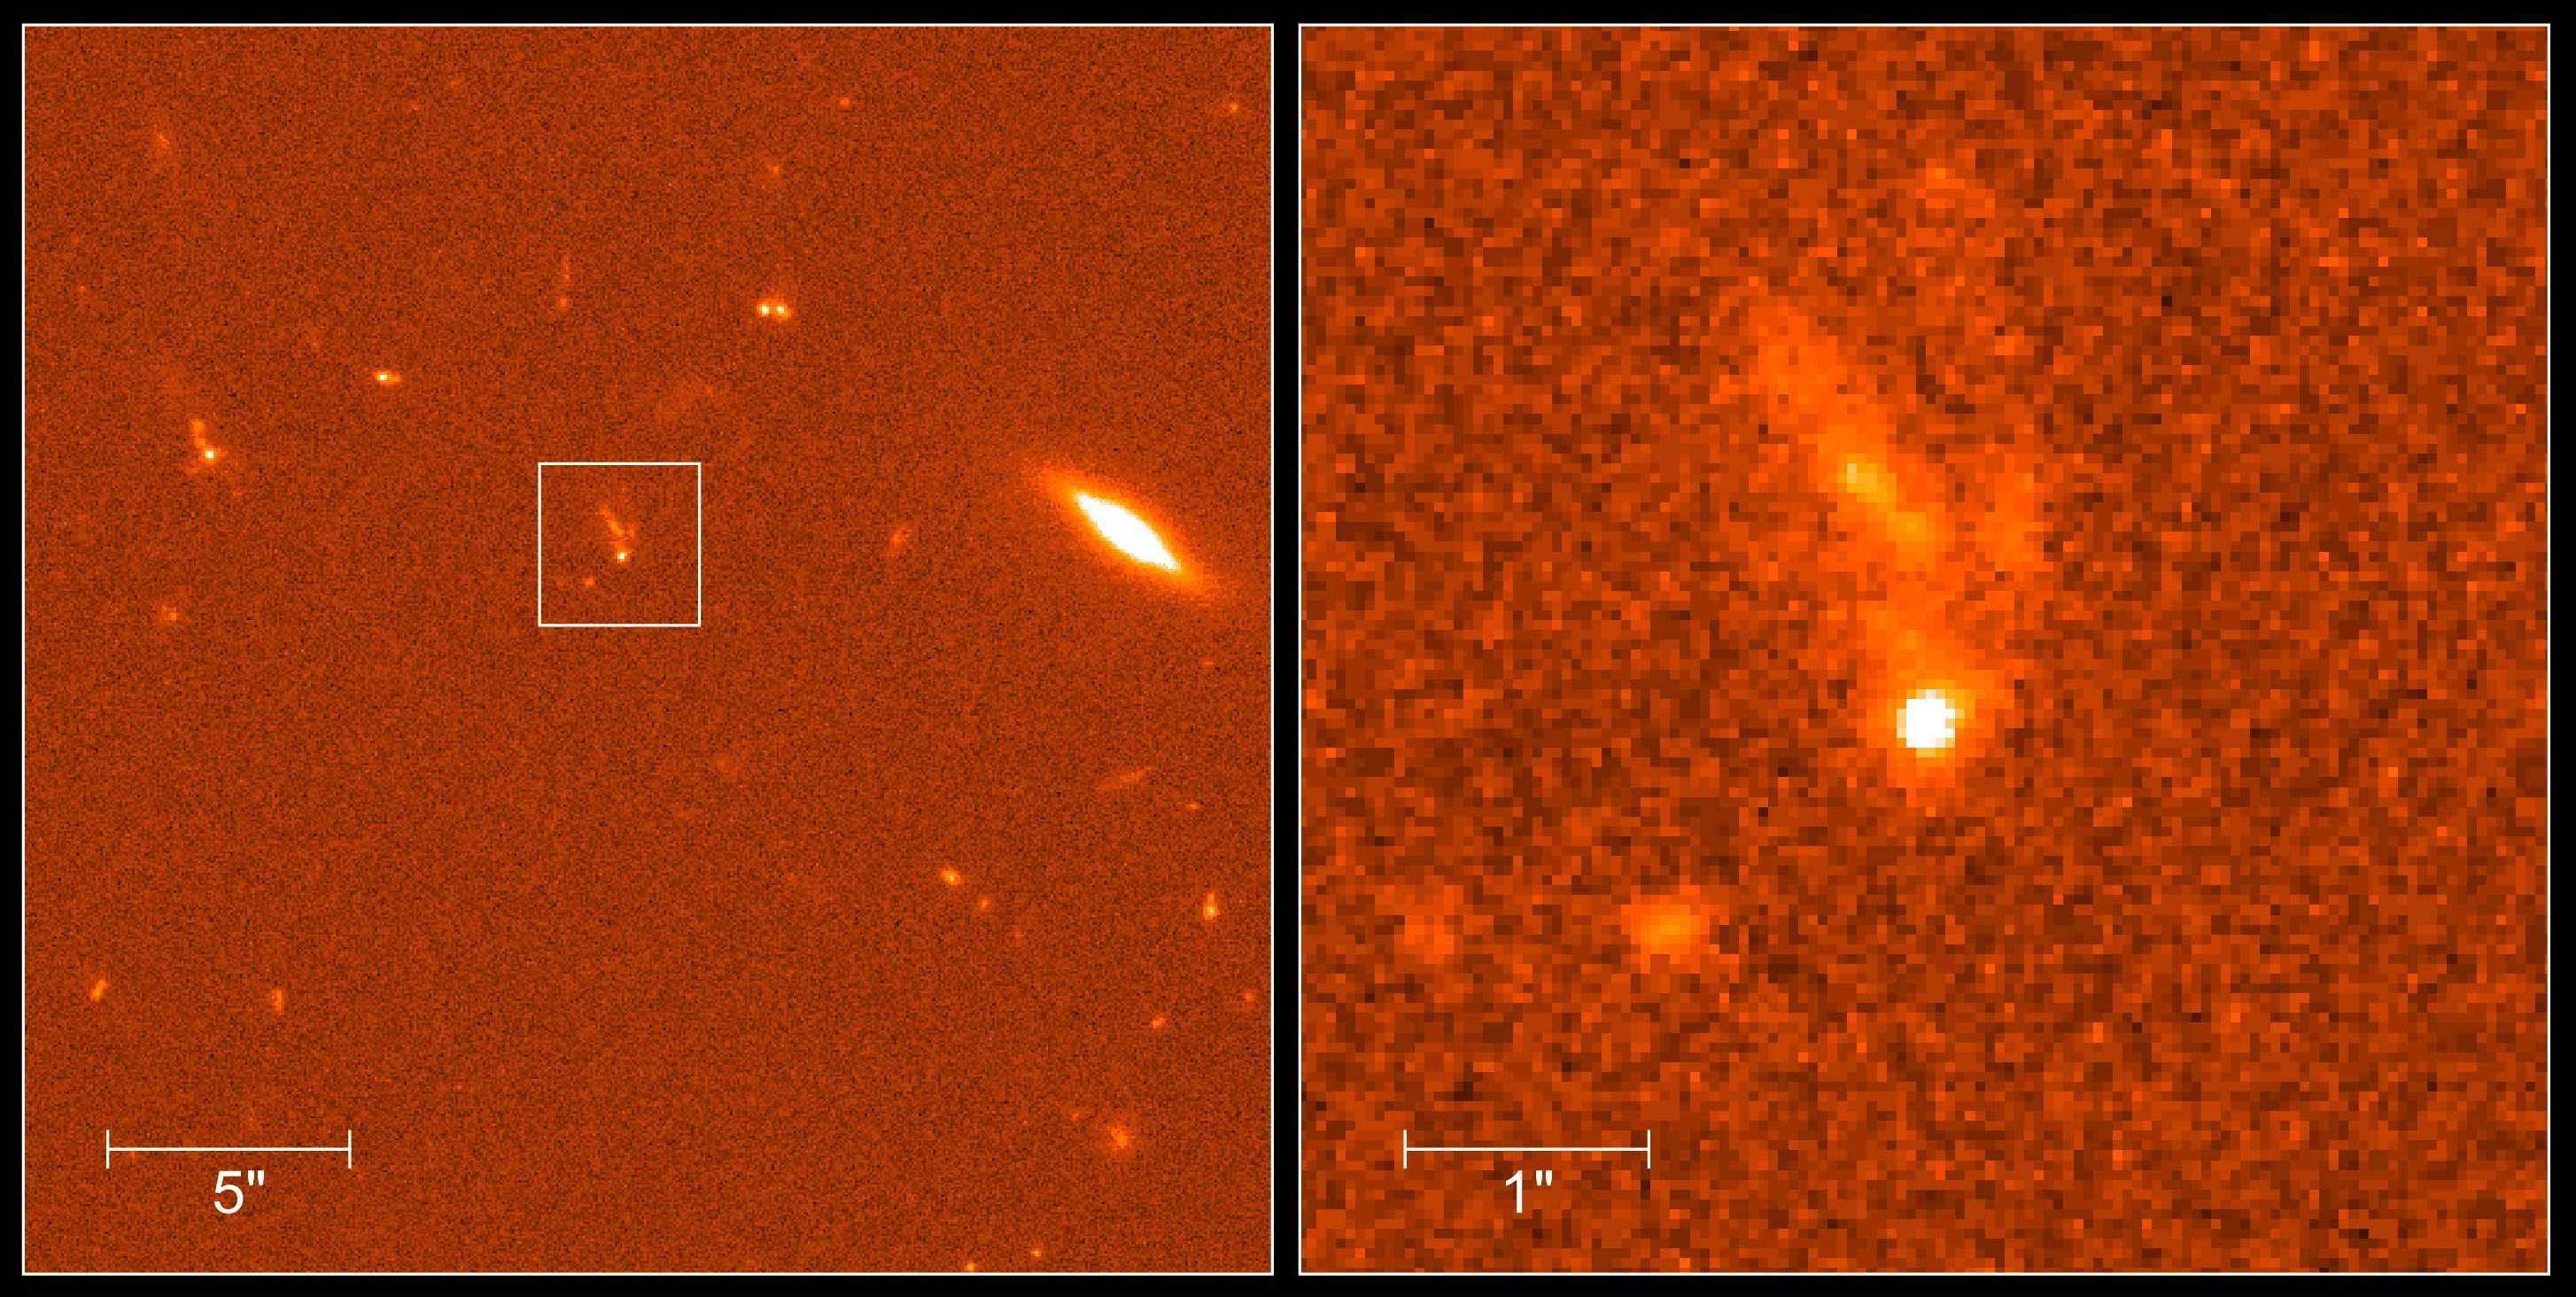 Gammarayburst-GRB990123.jpeg